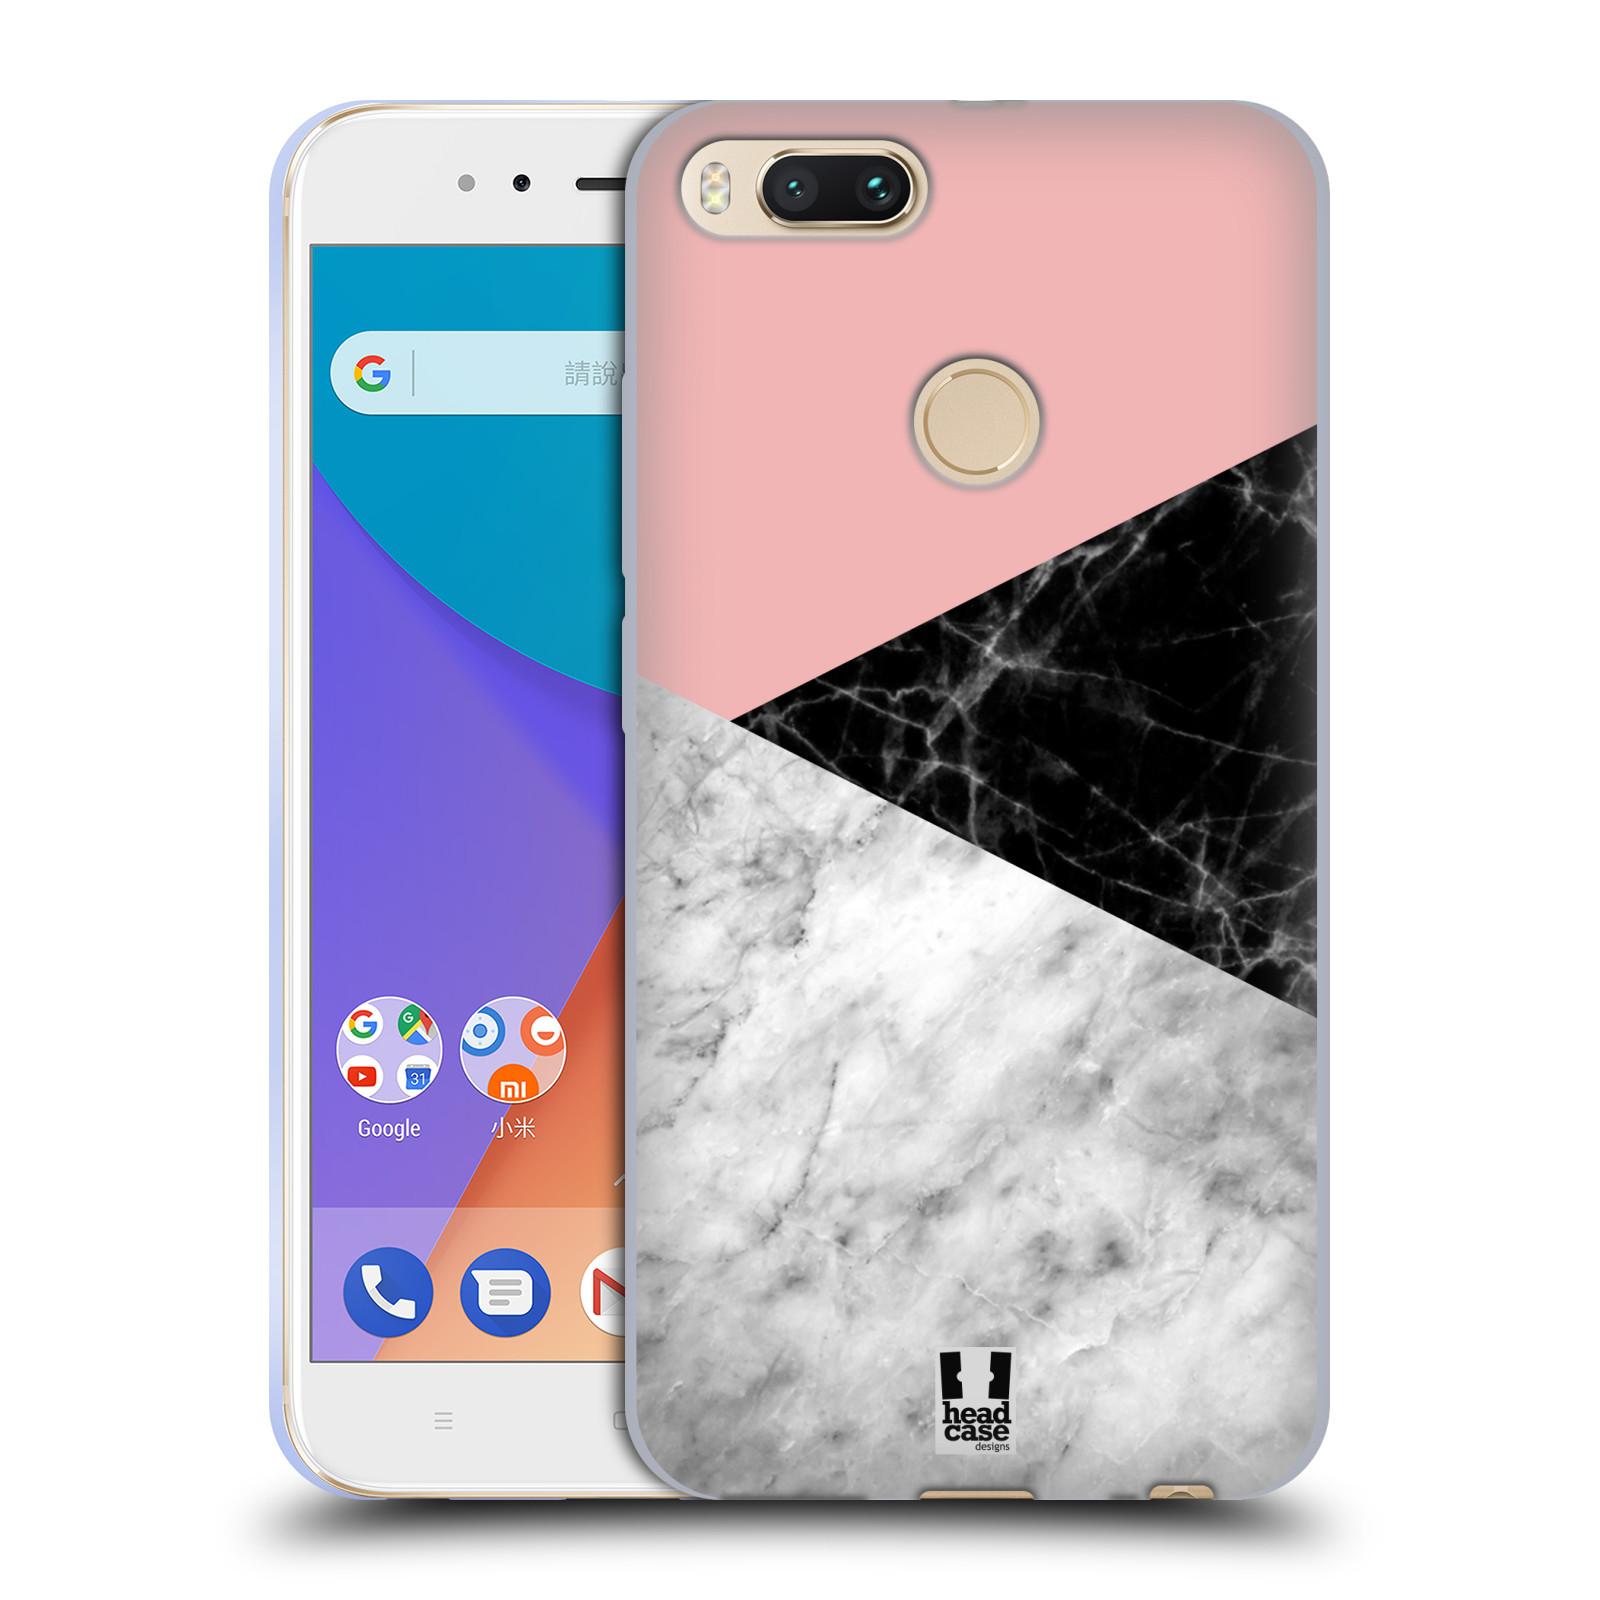 Silikonové pouzdro na mobil Xiaomi Mi A1 - Head Case - Mramor mix